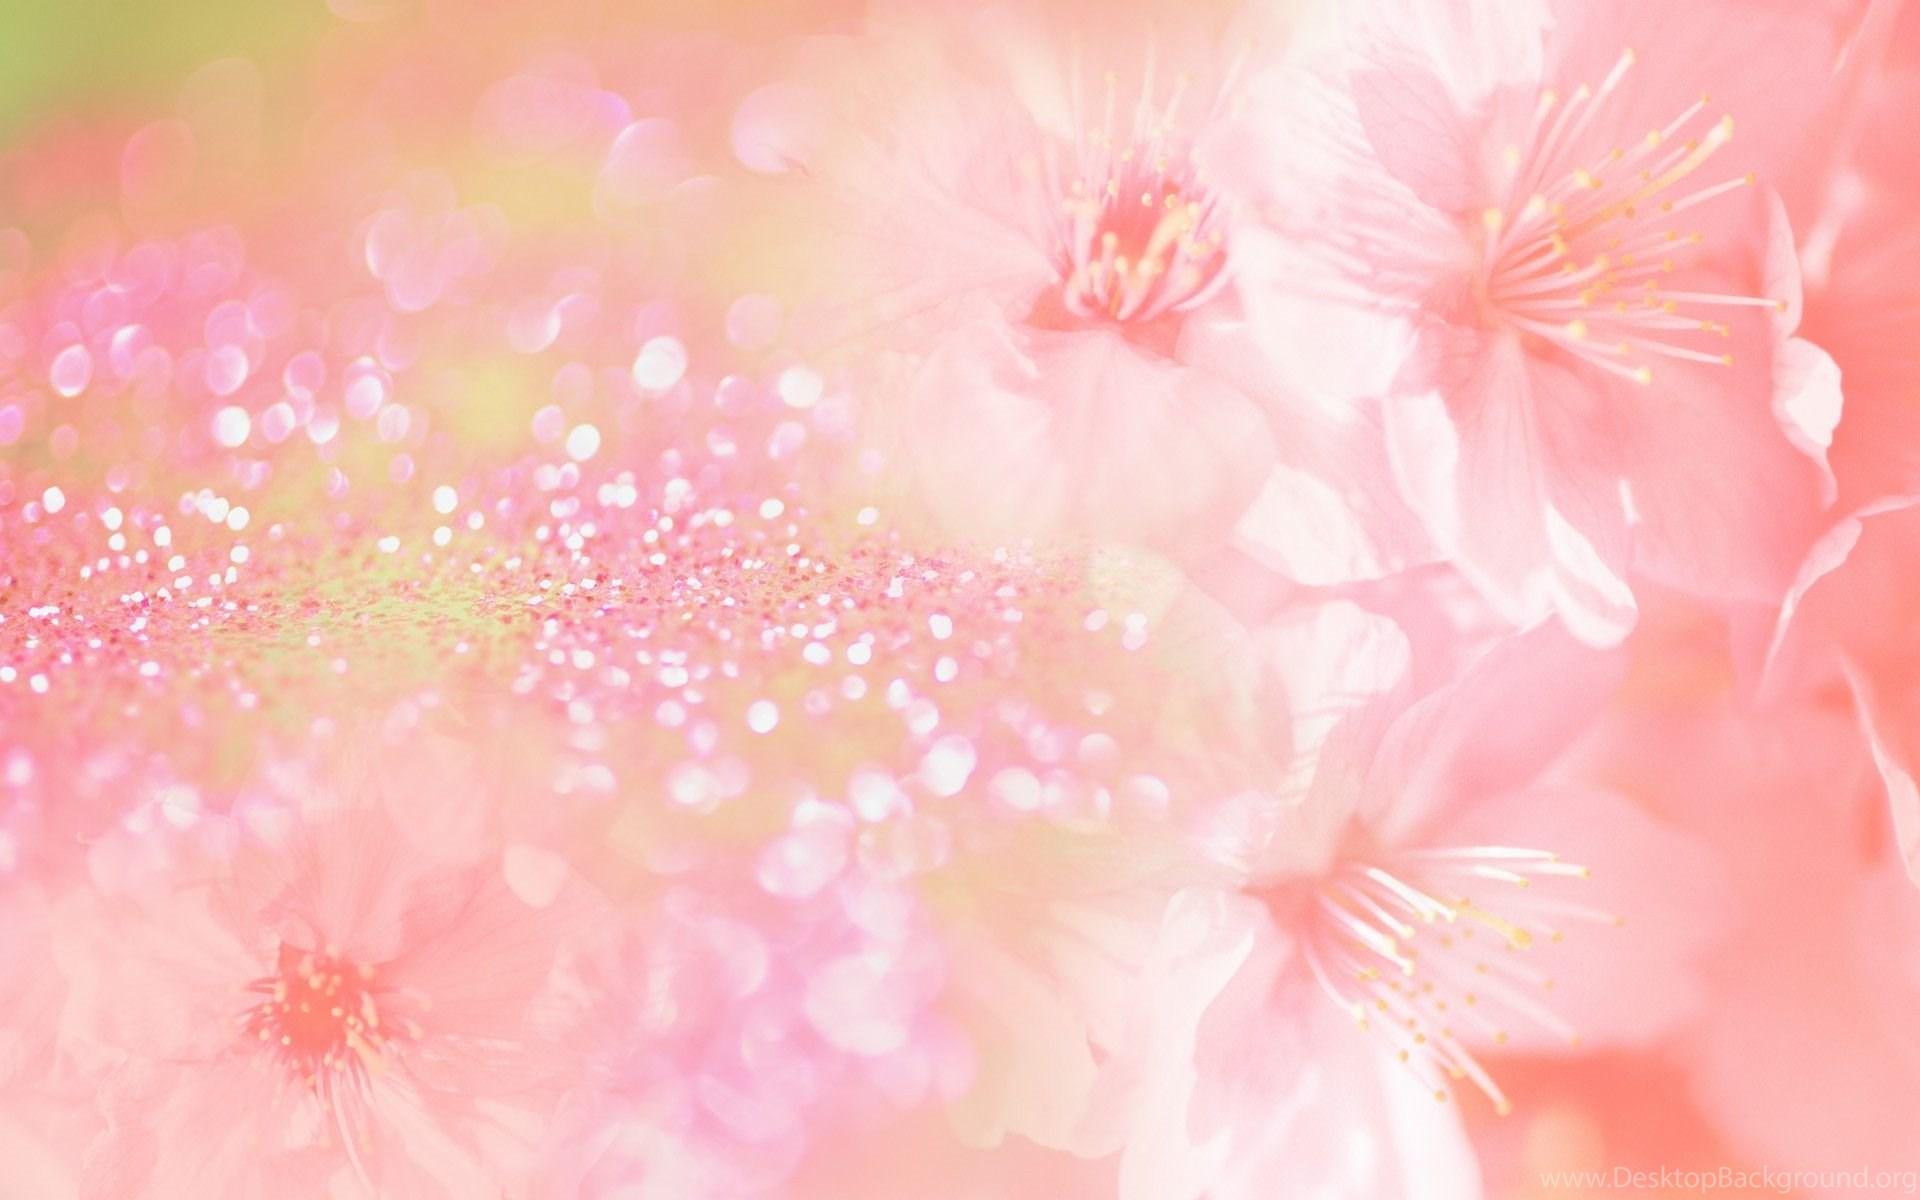 Pink Flower Wallpaper Backgrounds Wallpapers Cave Desktop Background